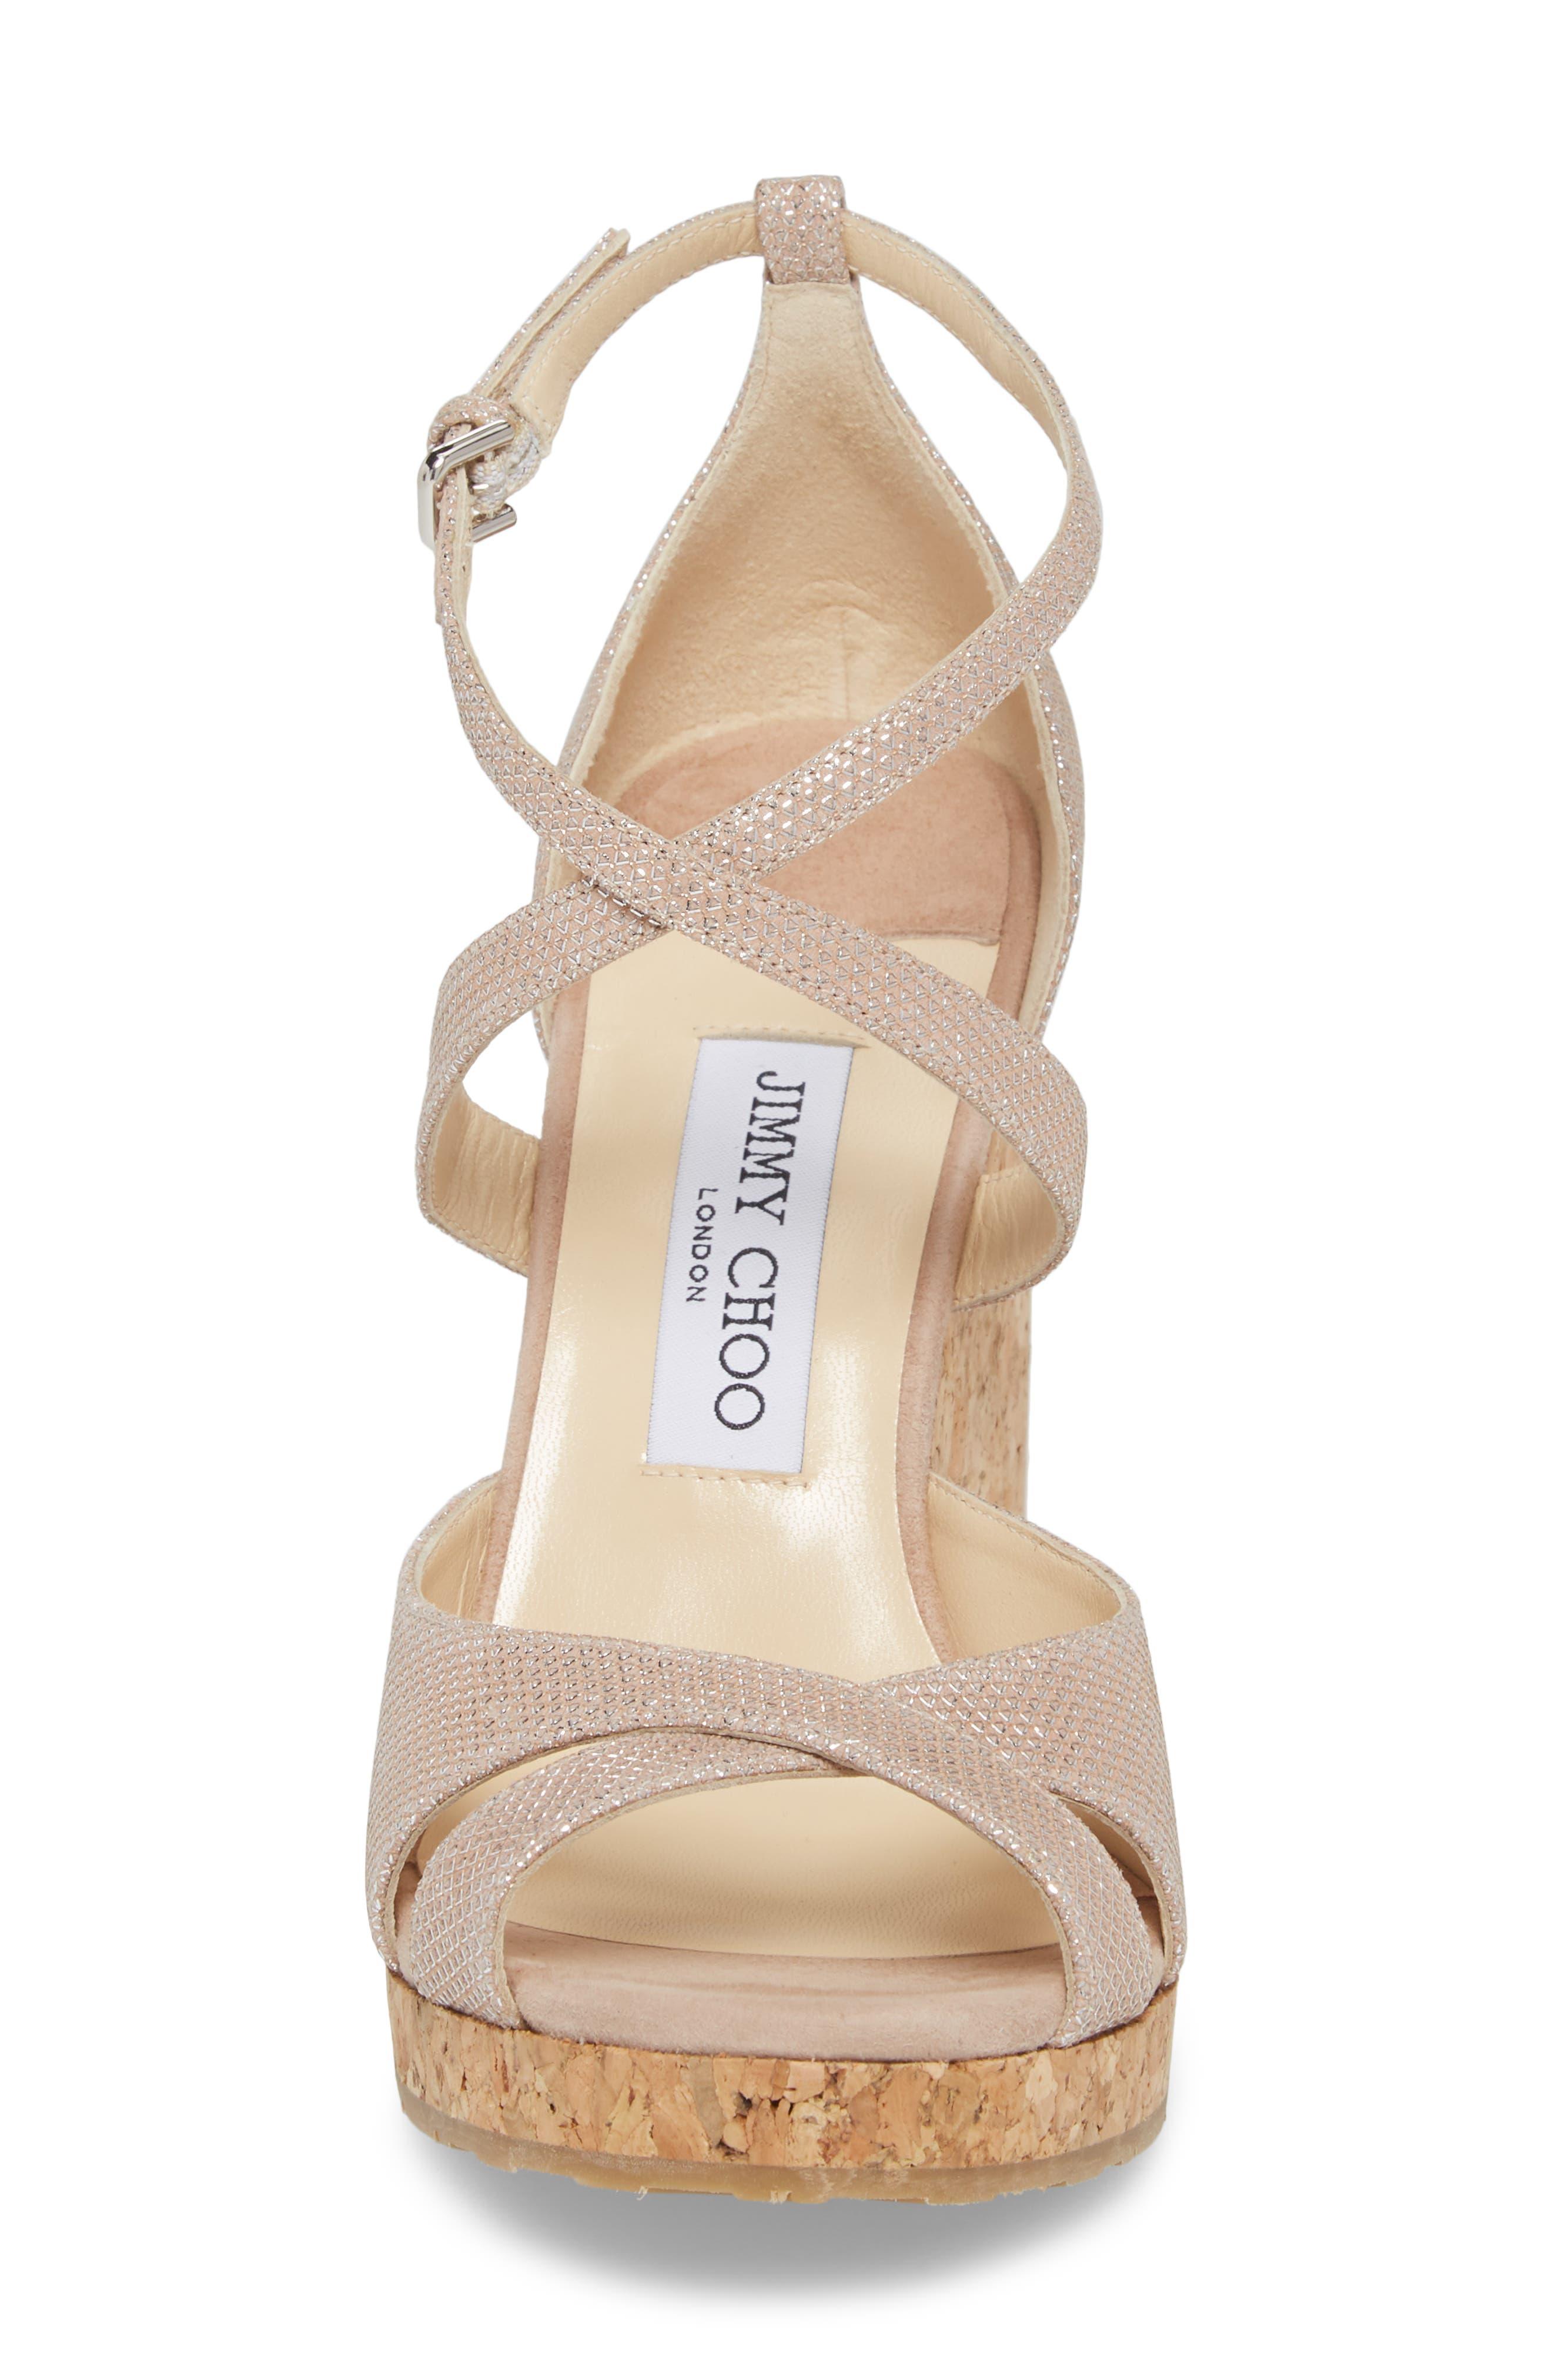 Alanah Espadrille Wedge Sandal,                             Alternate thumbnail 4, color,                             Ballet Pink Glitter